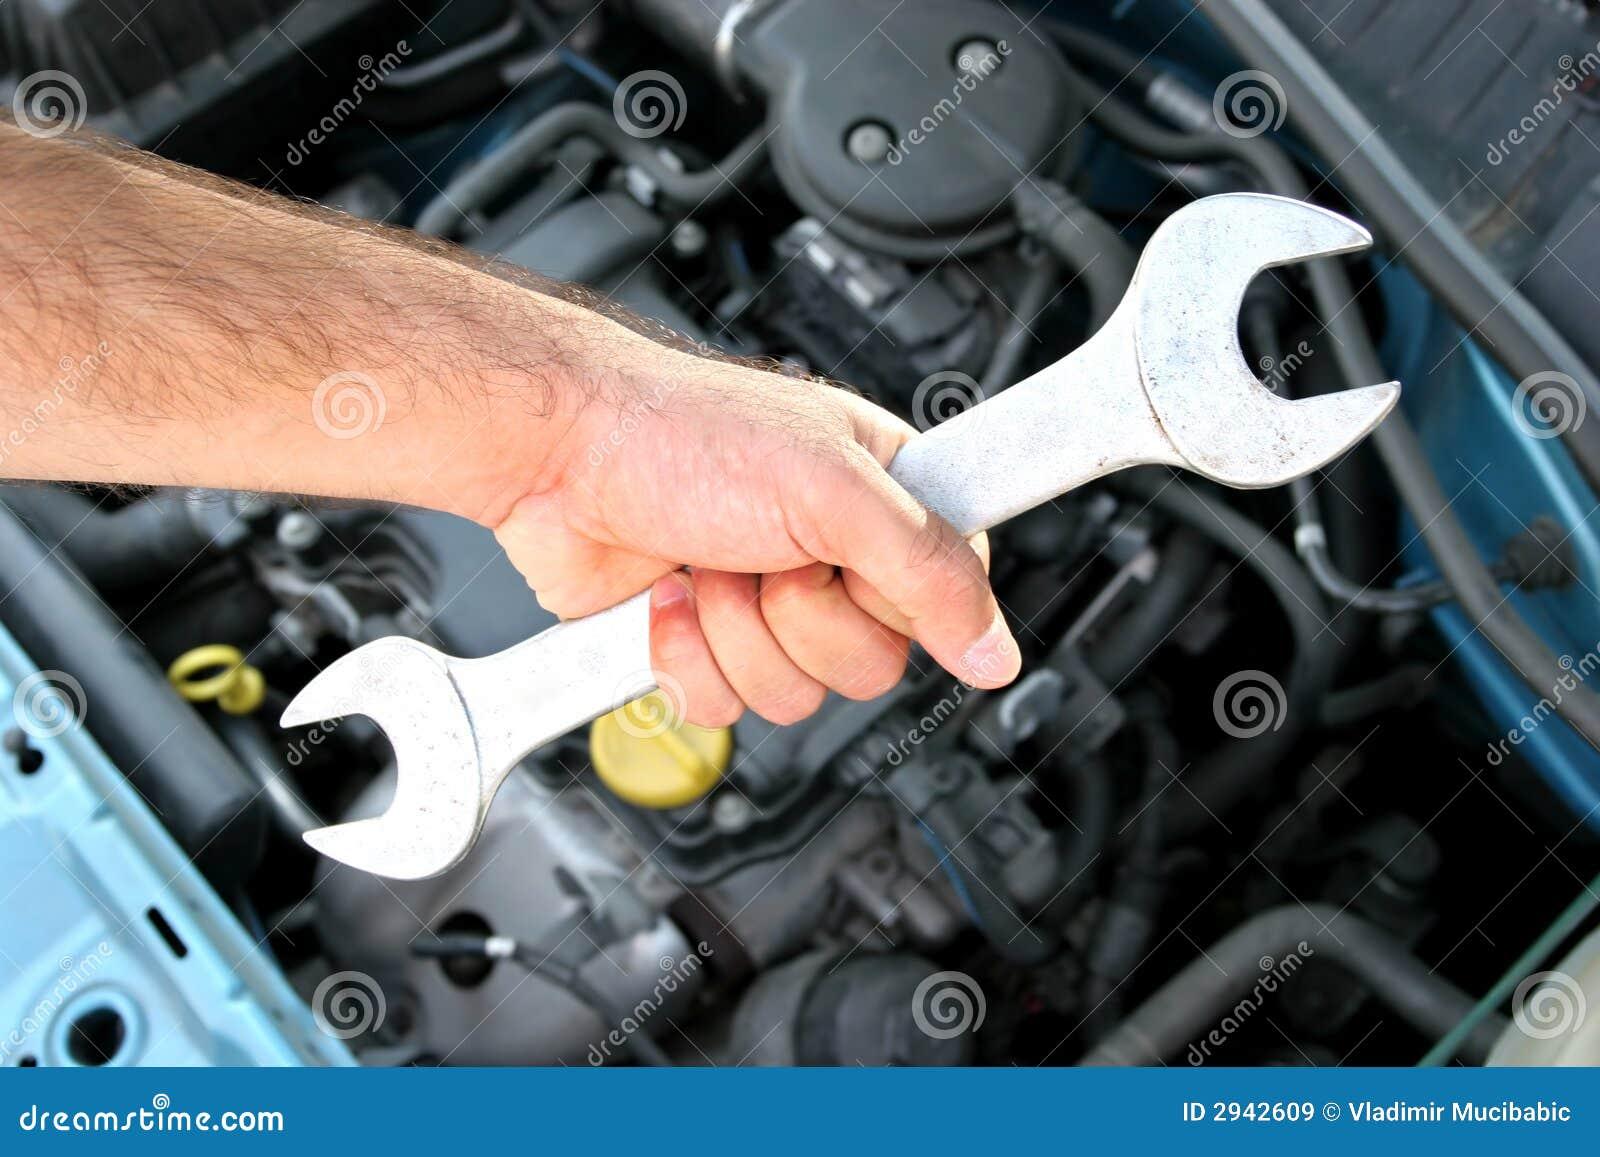 Mantenimiento un coche